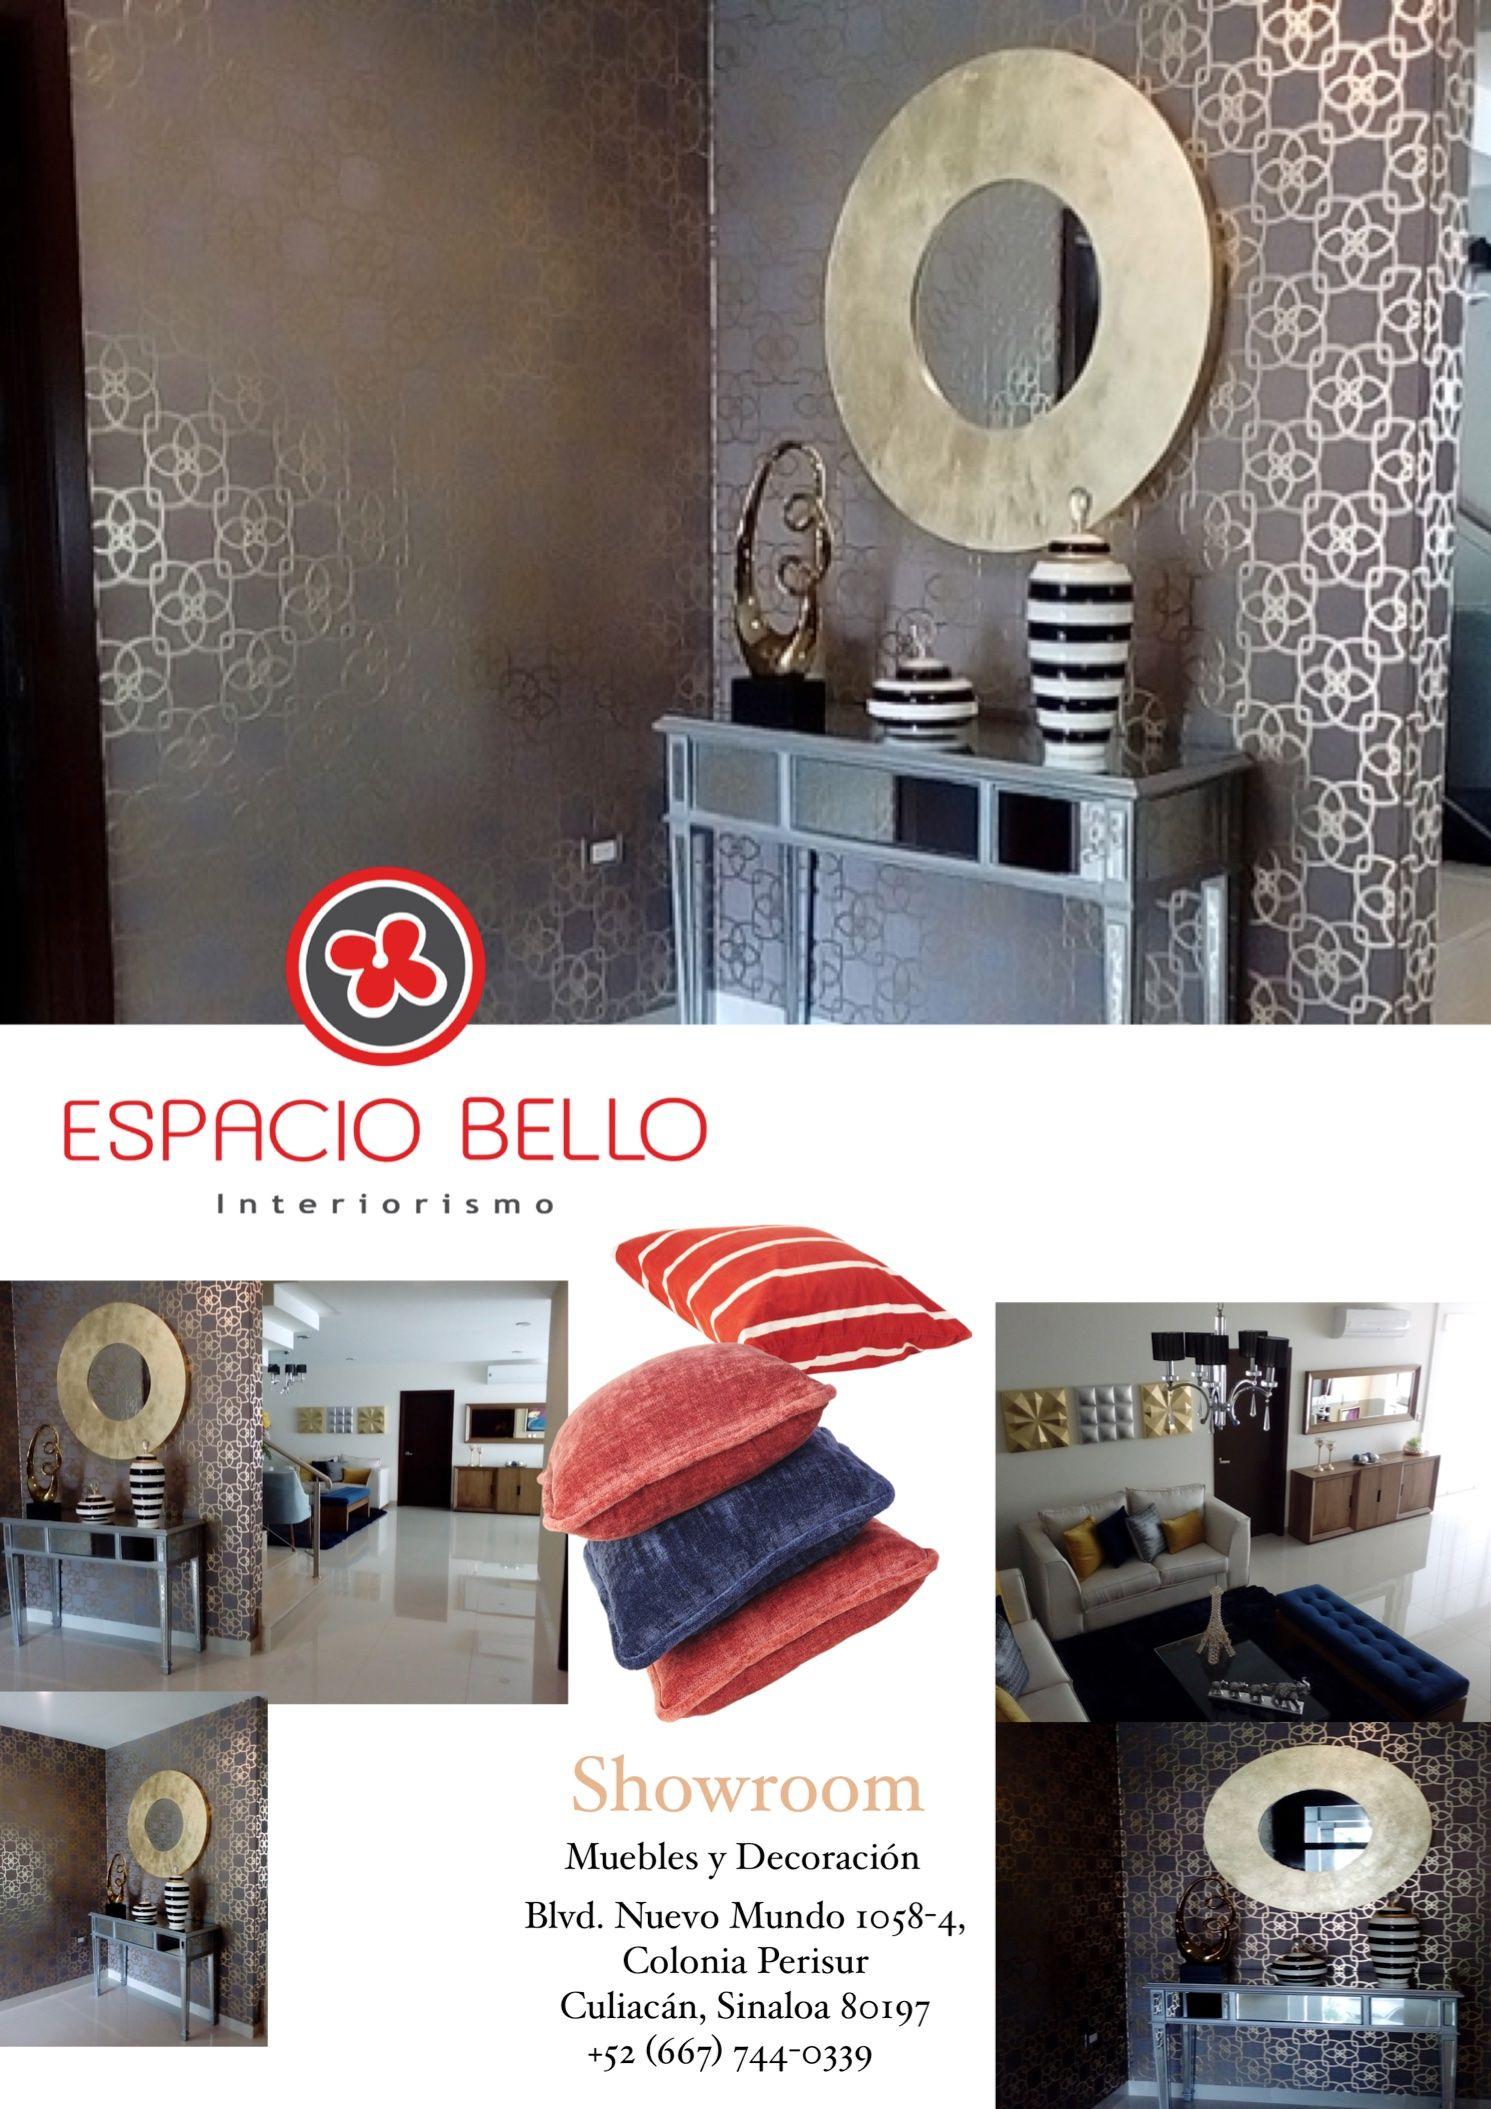 Espacio Bello Muebles E Interiorismo Blvd Nuevo Mundo 1058 4  # Muebles Nuevo Mundo